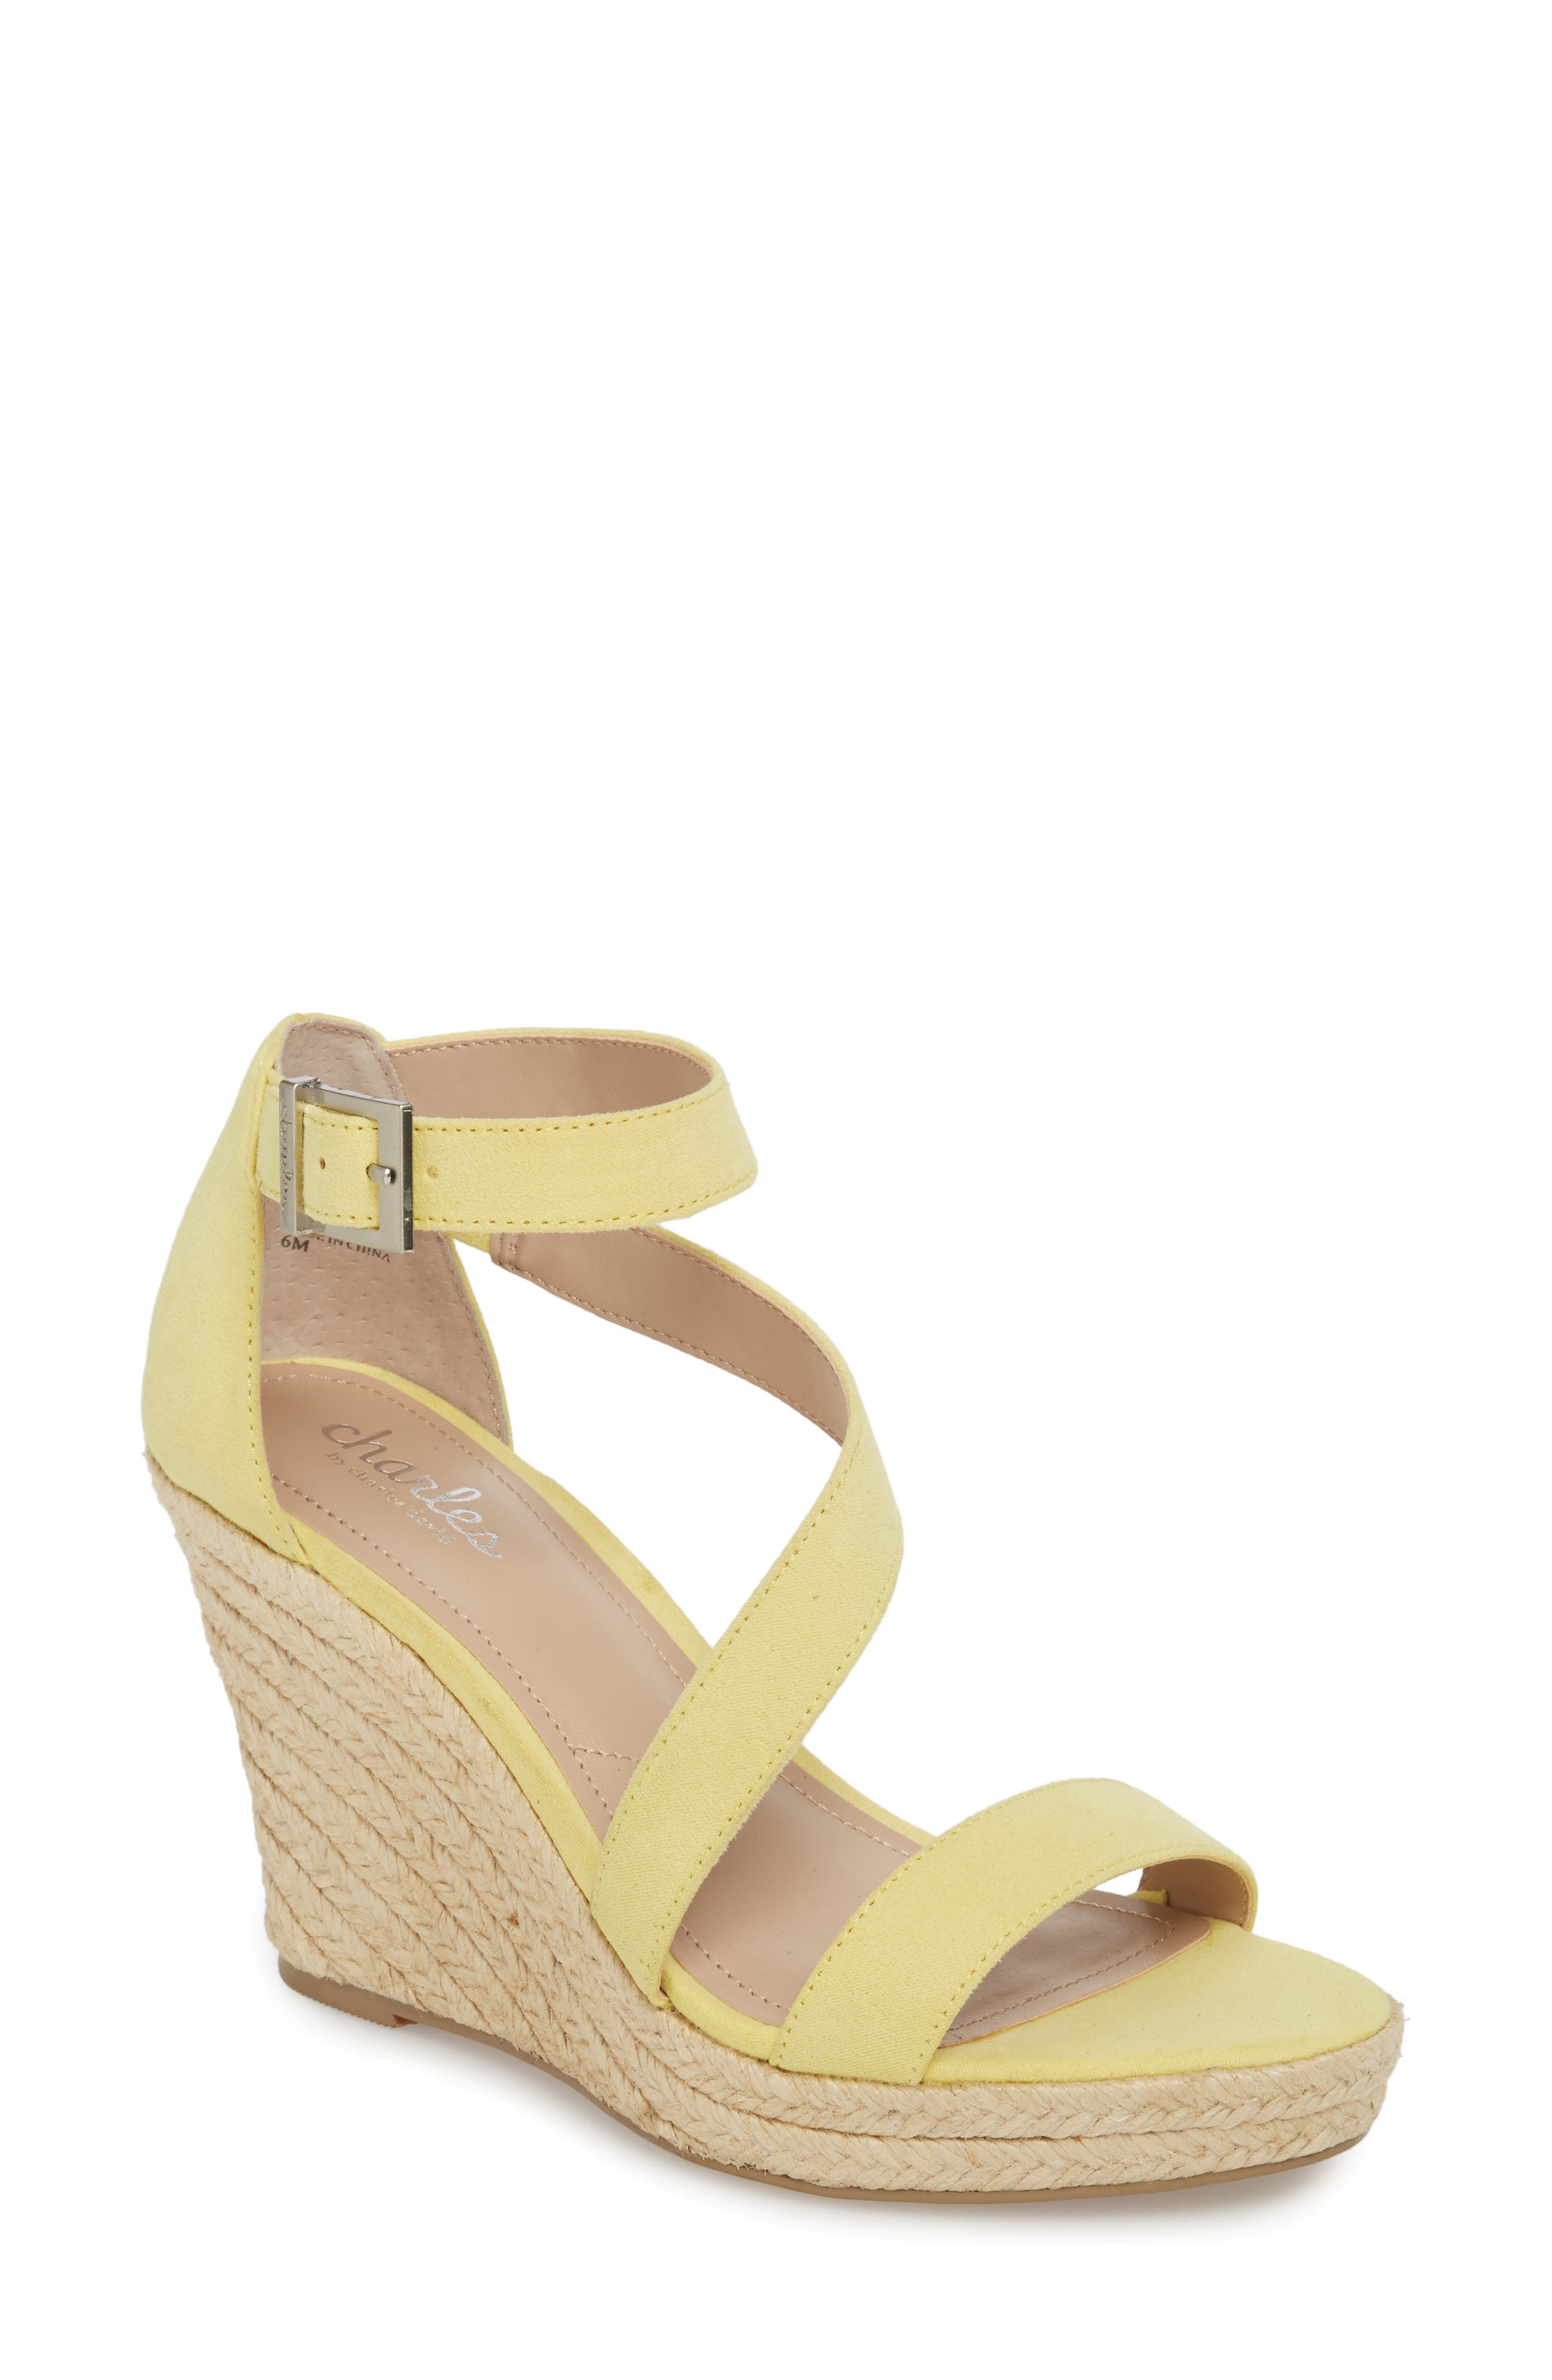 Lou Asymmetrical Wedge Sandal,                         Main,                         color, BUTTERCUP SUEDE